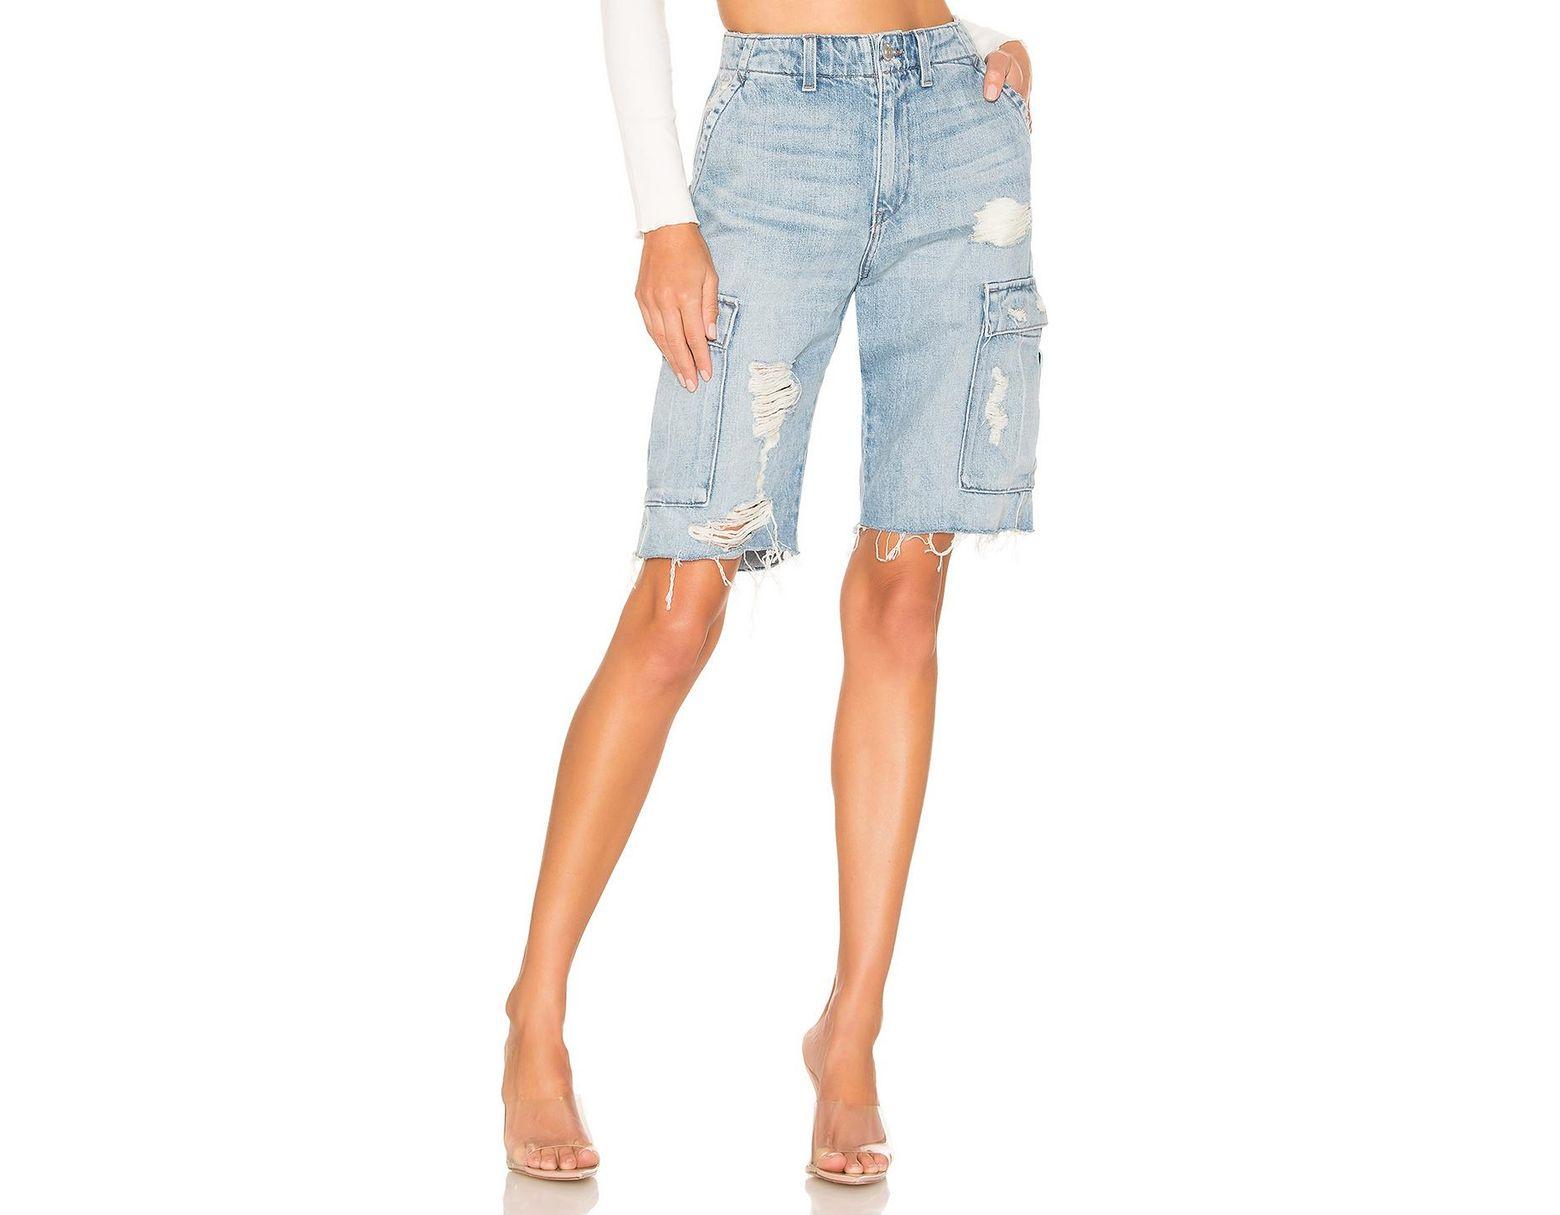 86b8eaf5d6 Hudson Jeans Jane Relaxed Cargo Short in Blue - Lyst